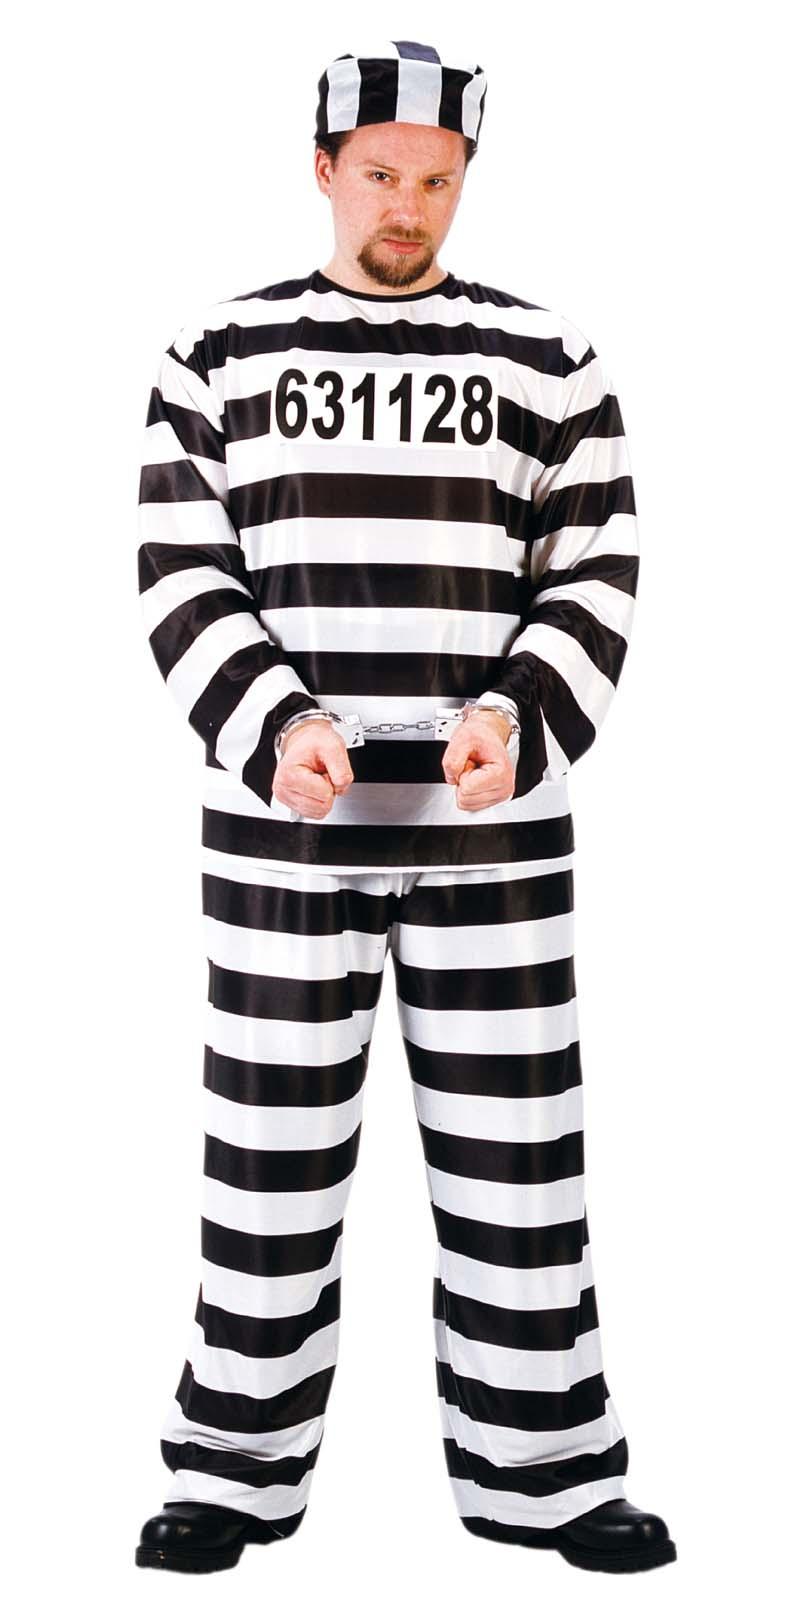 jailbirdFW9918.jpg